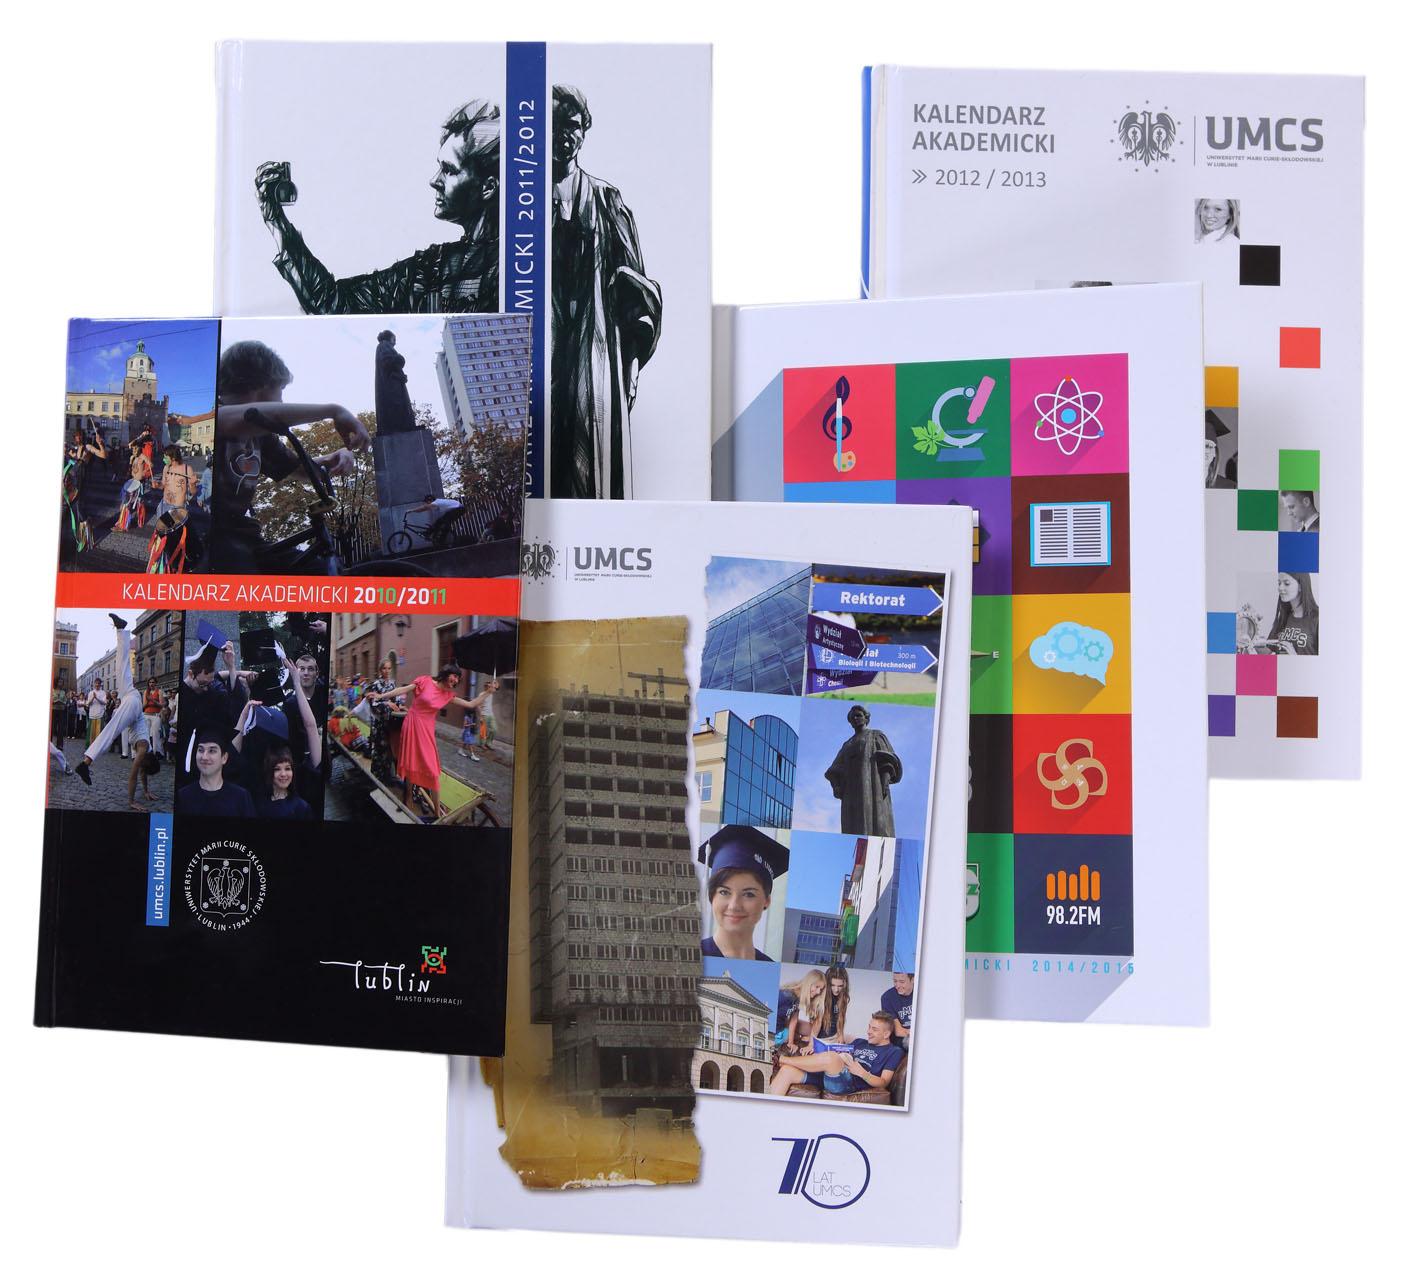 Kalendarz Akademicki UMCS